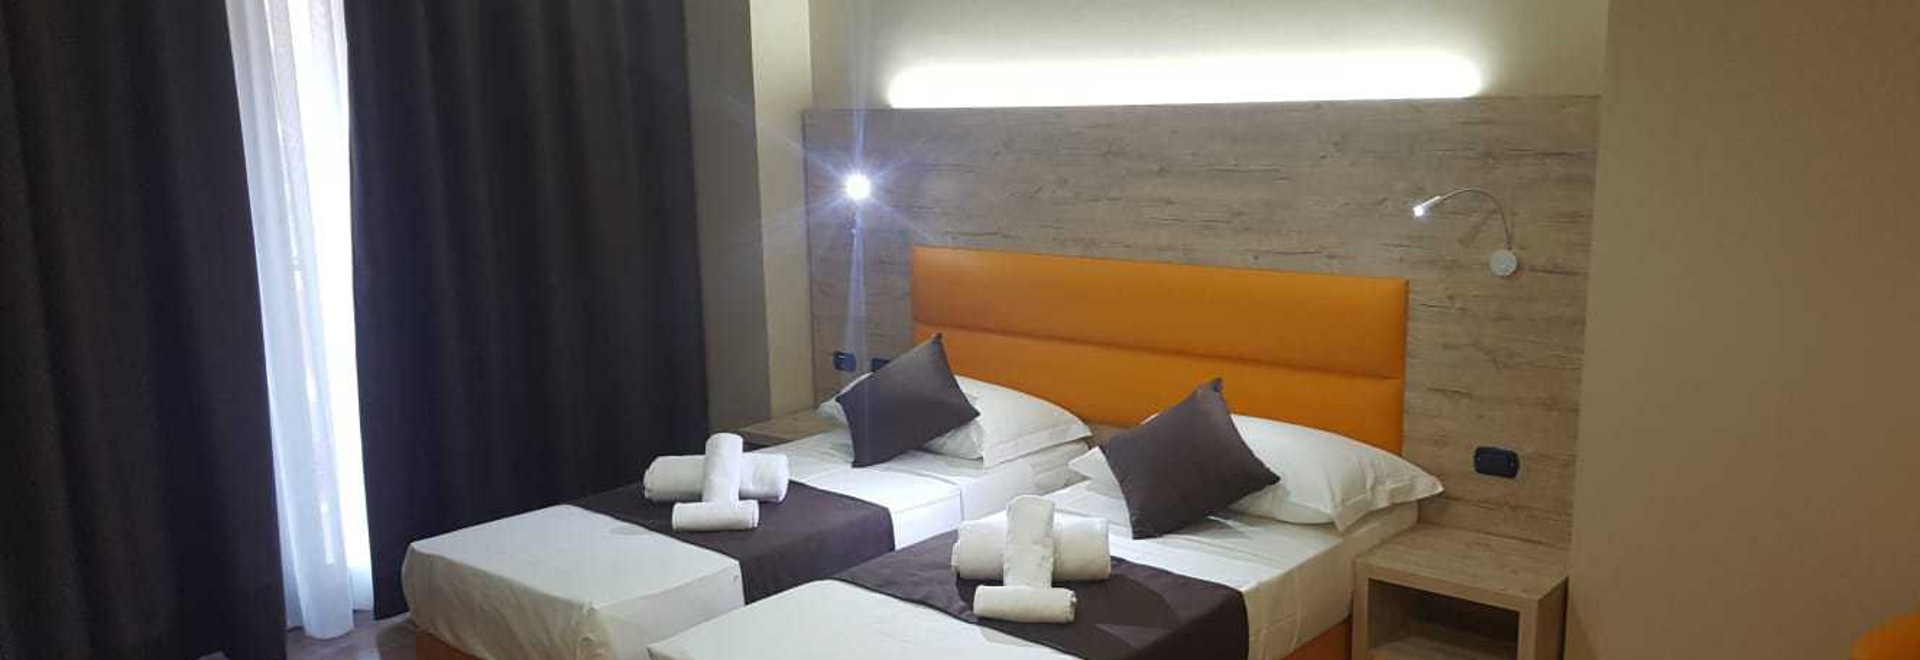 Mobilspazio hat Stardivari-Hotel in Mailand versorgt